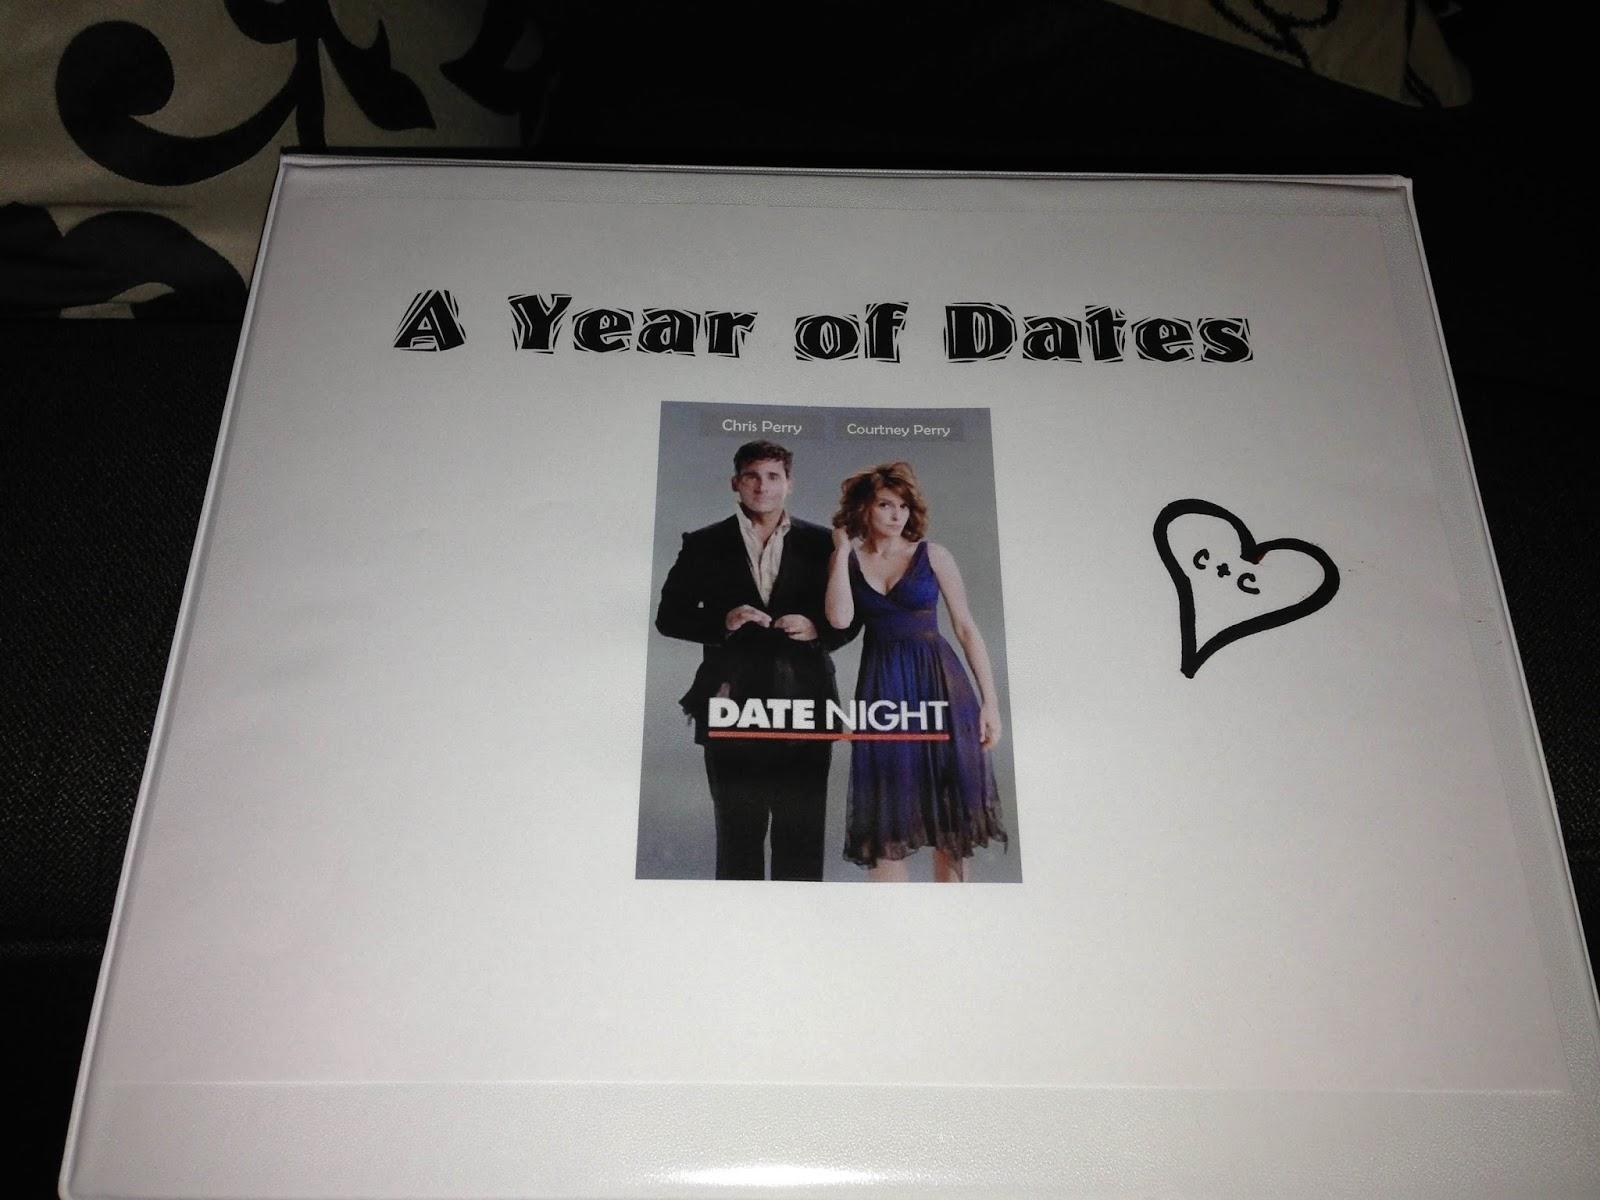 Unique Wedding Gift Idea The Date Night Binder